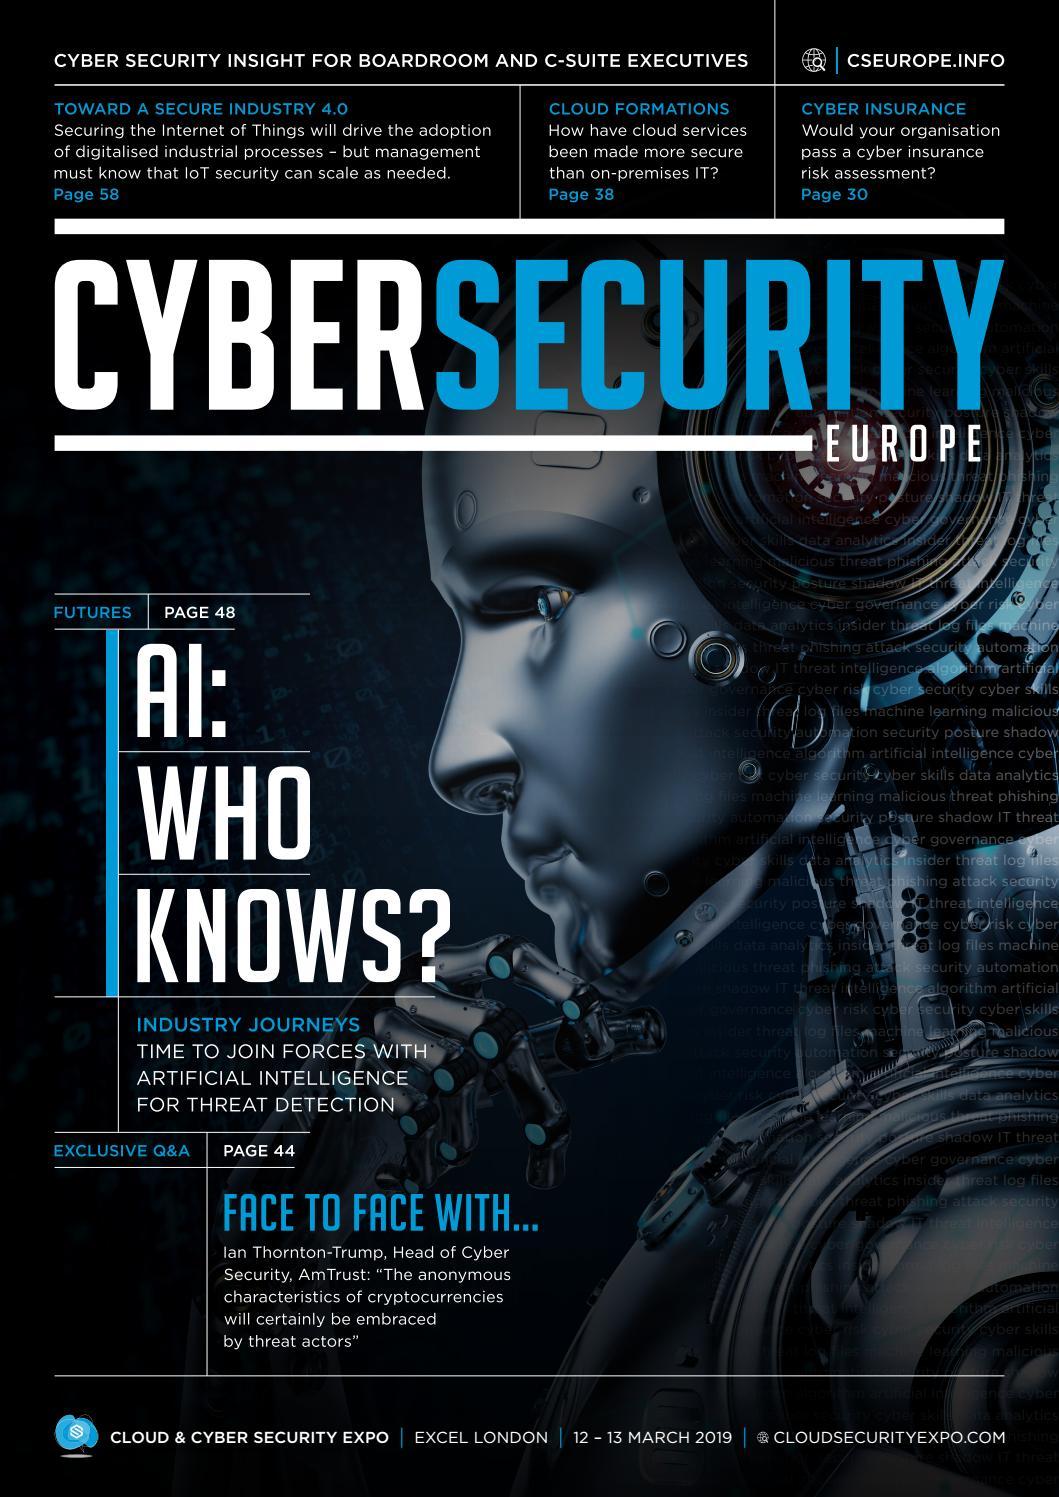 Cyber Security Europe - Spring 2019 by worldshowmedia - issuu